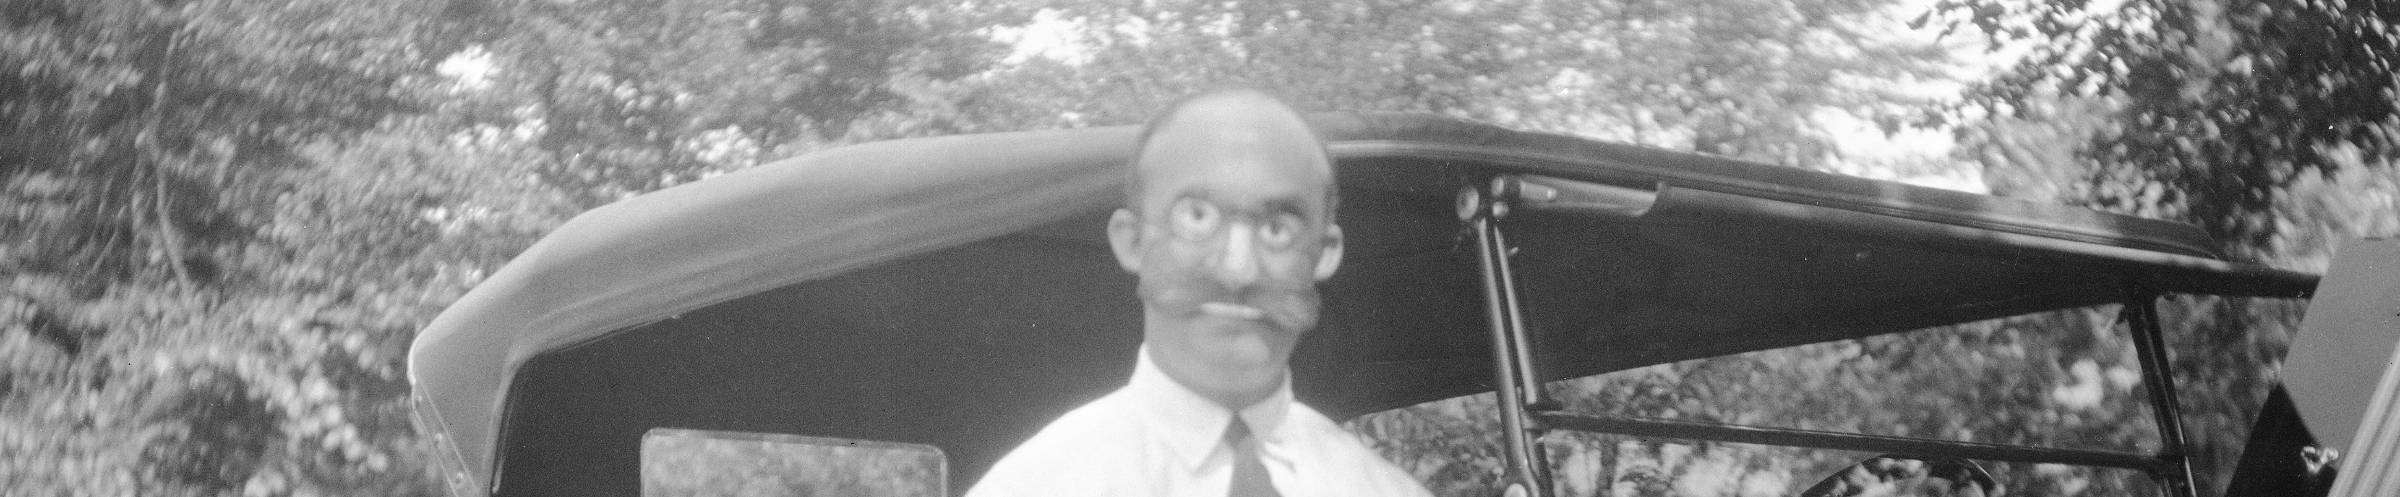 Mr. Clash wearing a mask at Bushkill